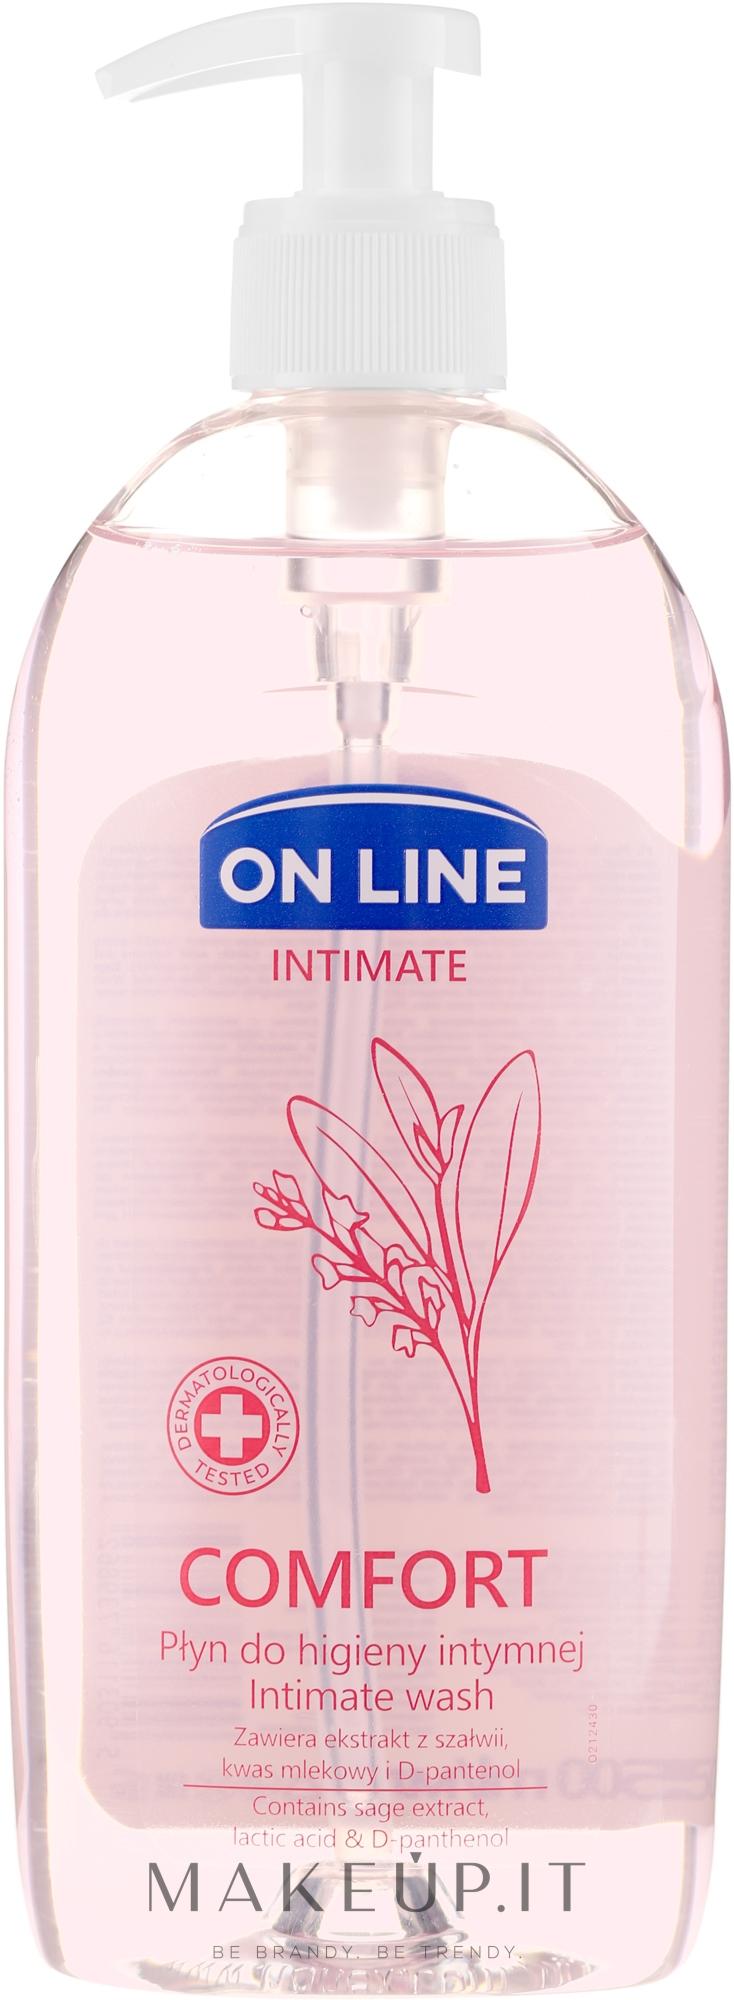 "Detergente intimo ""Salvia"" - On Line Intimate Comfort Intimate Wash — foto 500 ml"